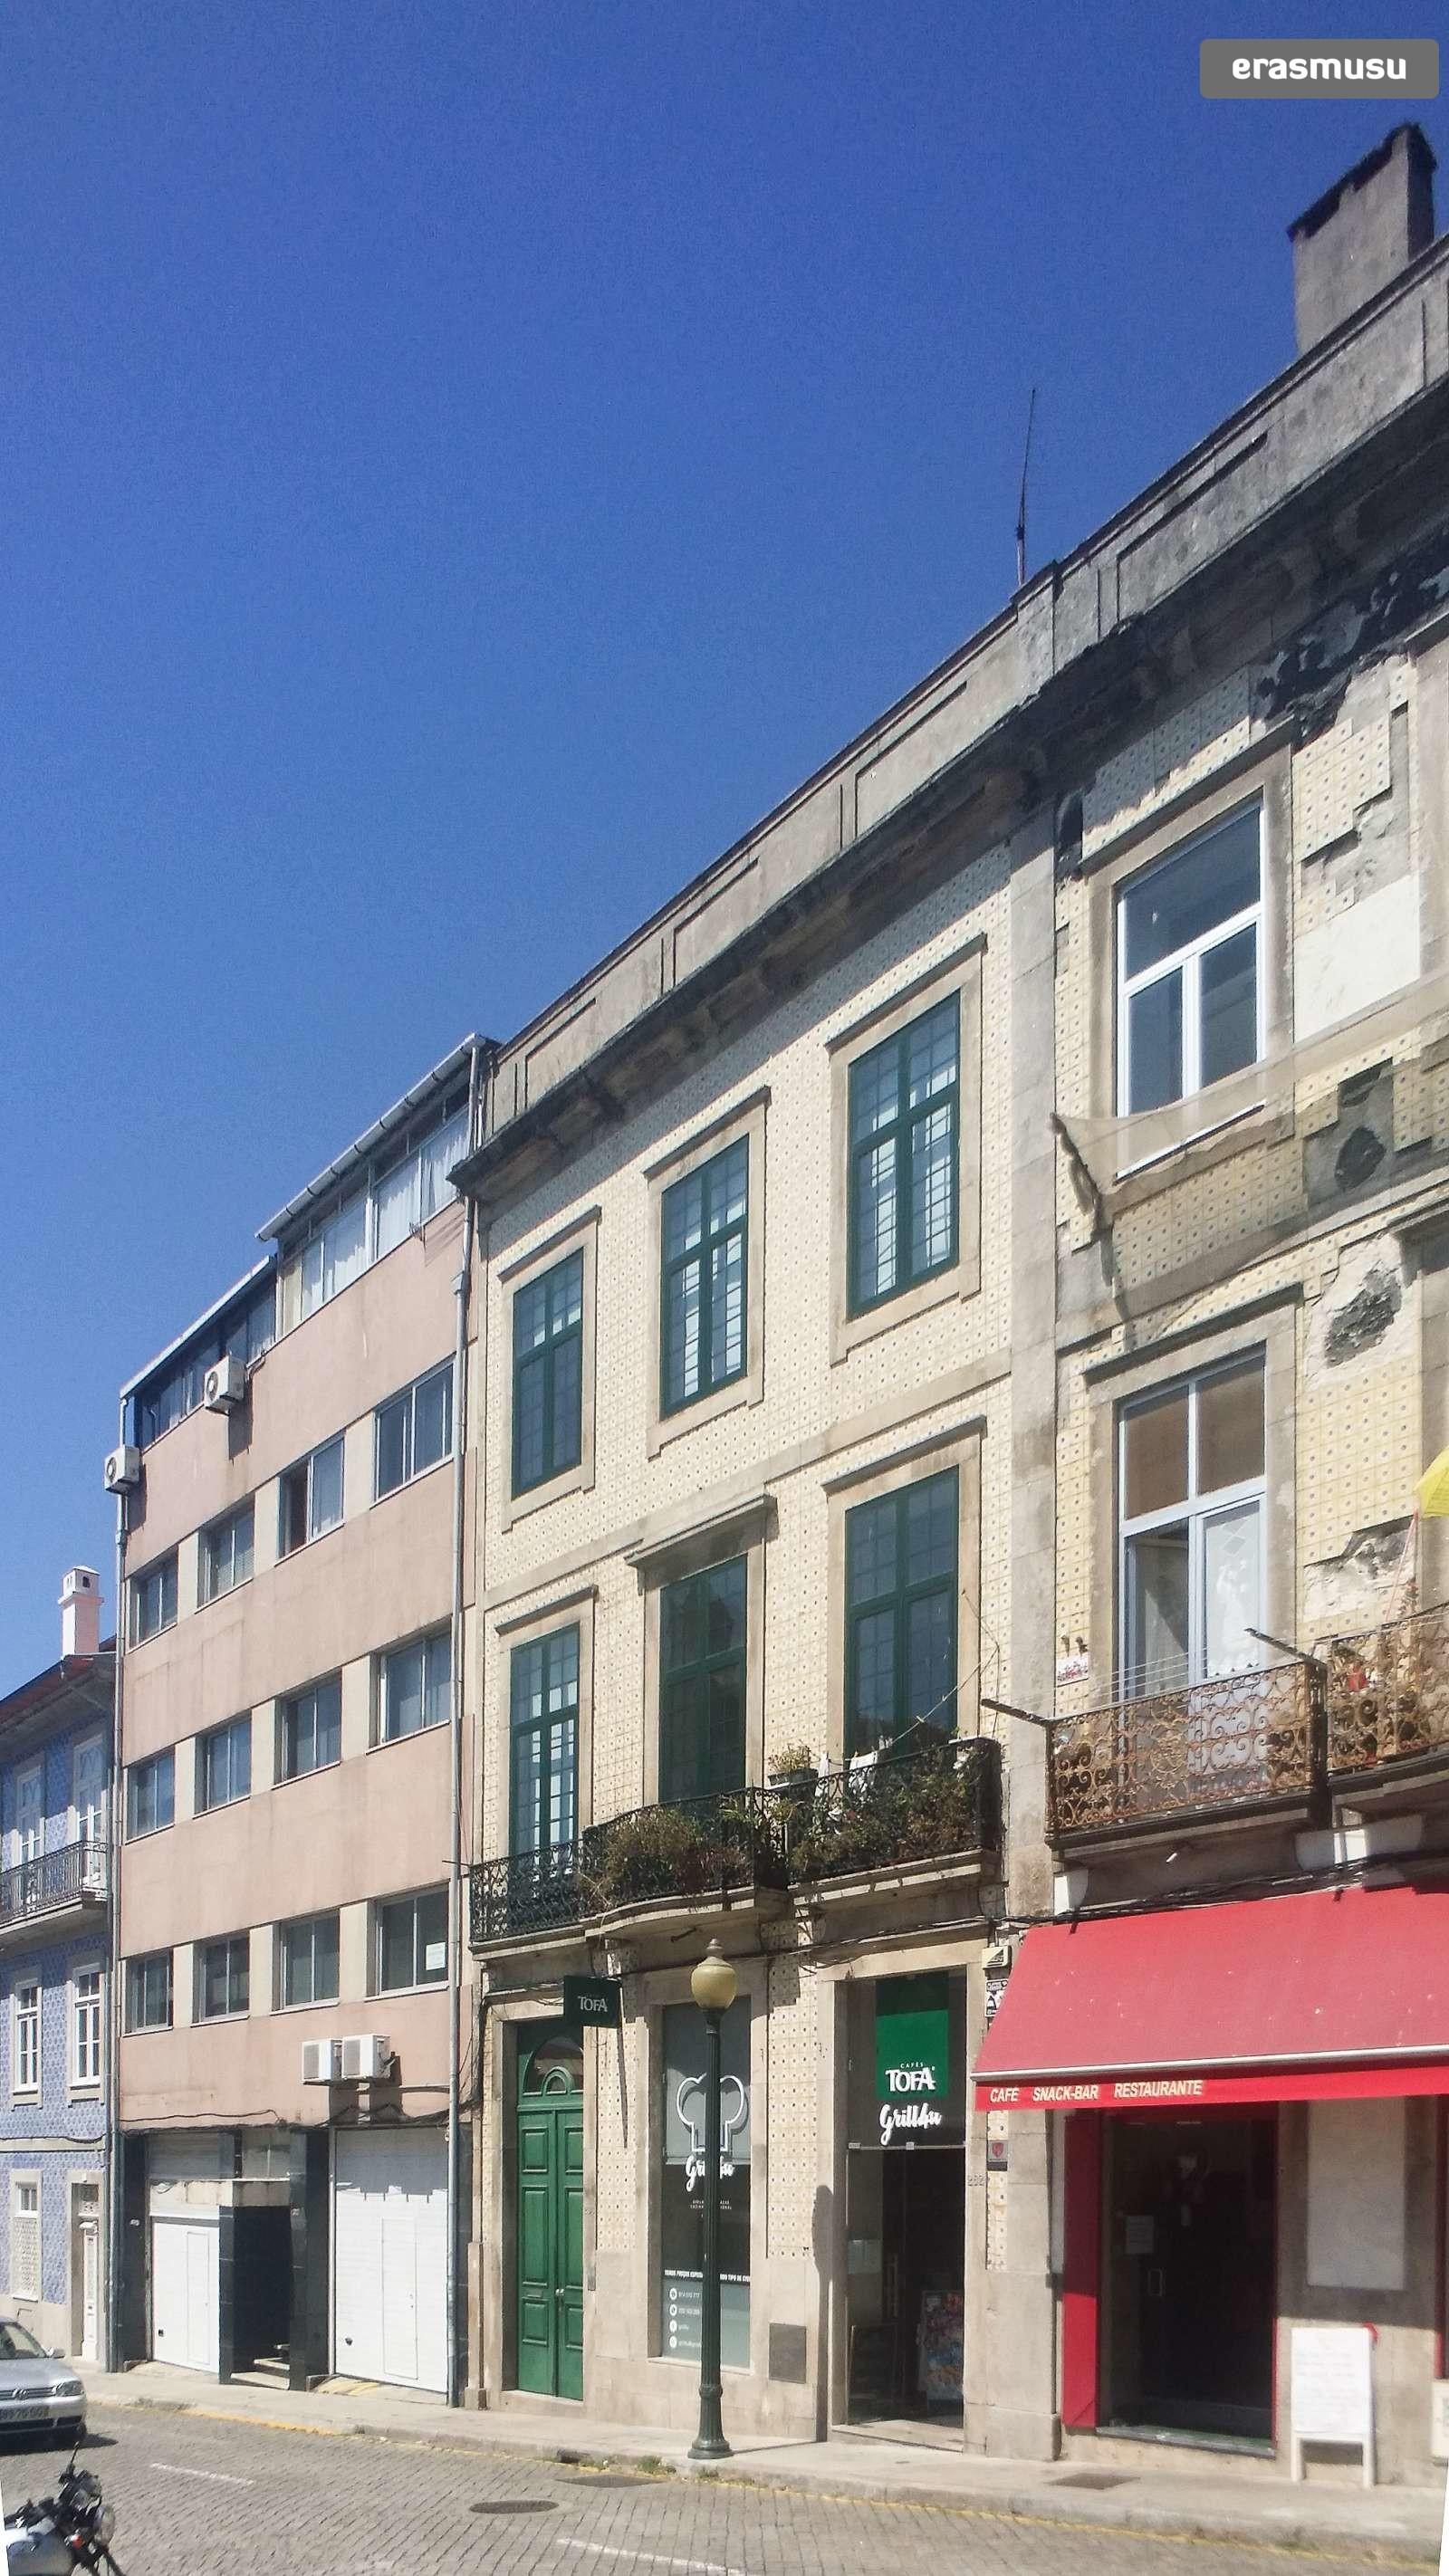 bright-studio-apartment-rent-cedofeita-43e585d50e635c65803c3ddac